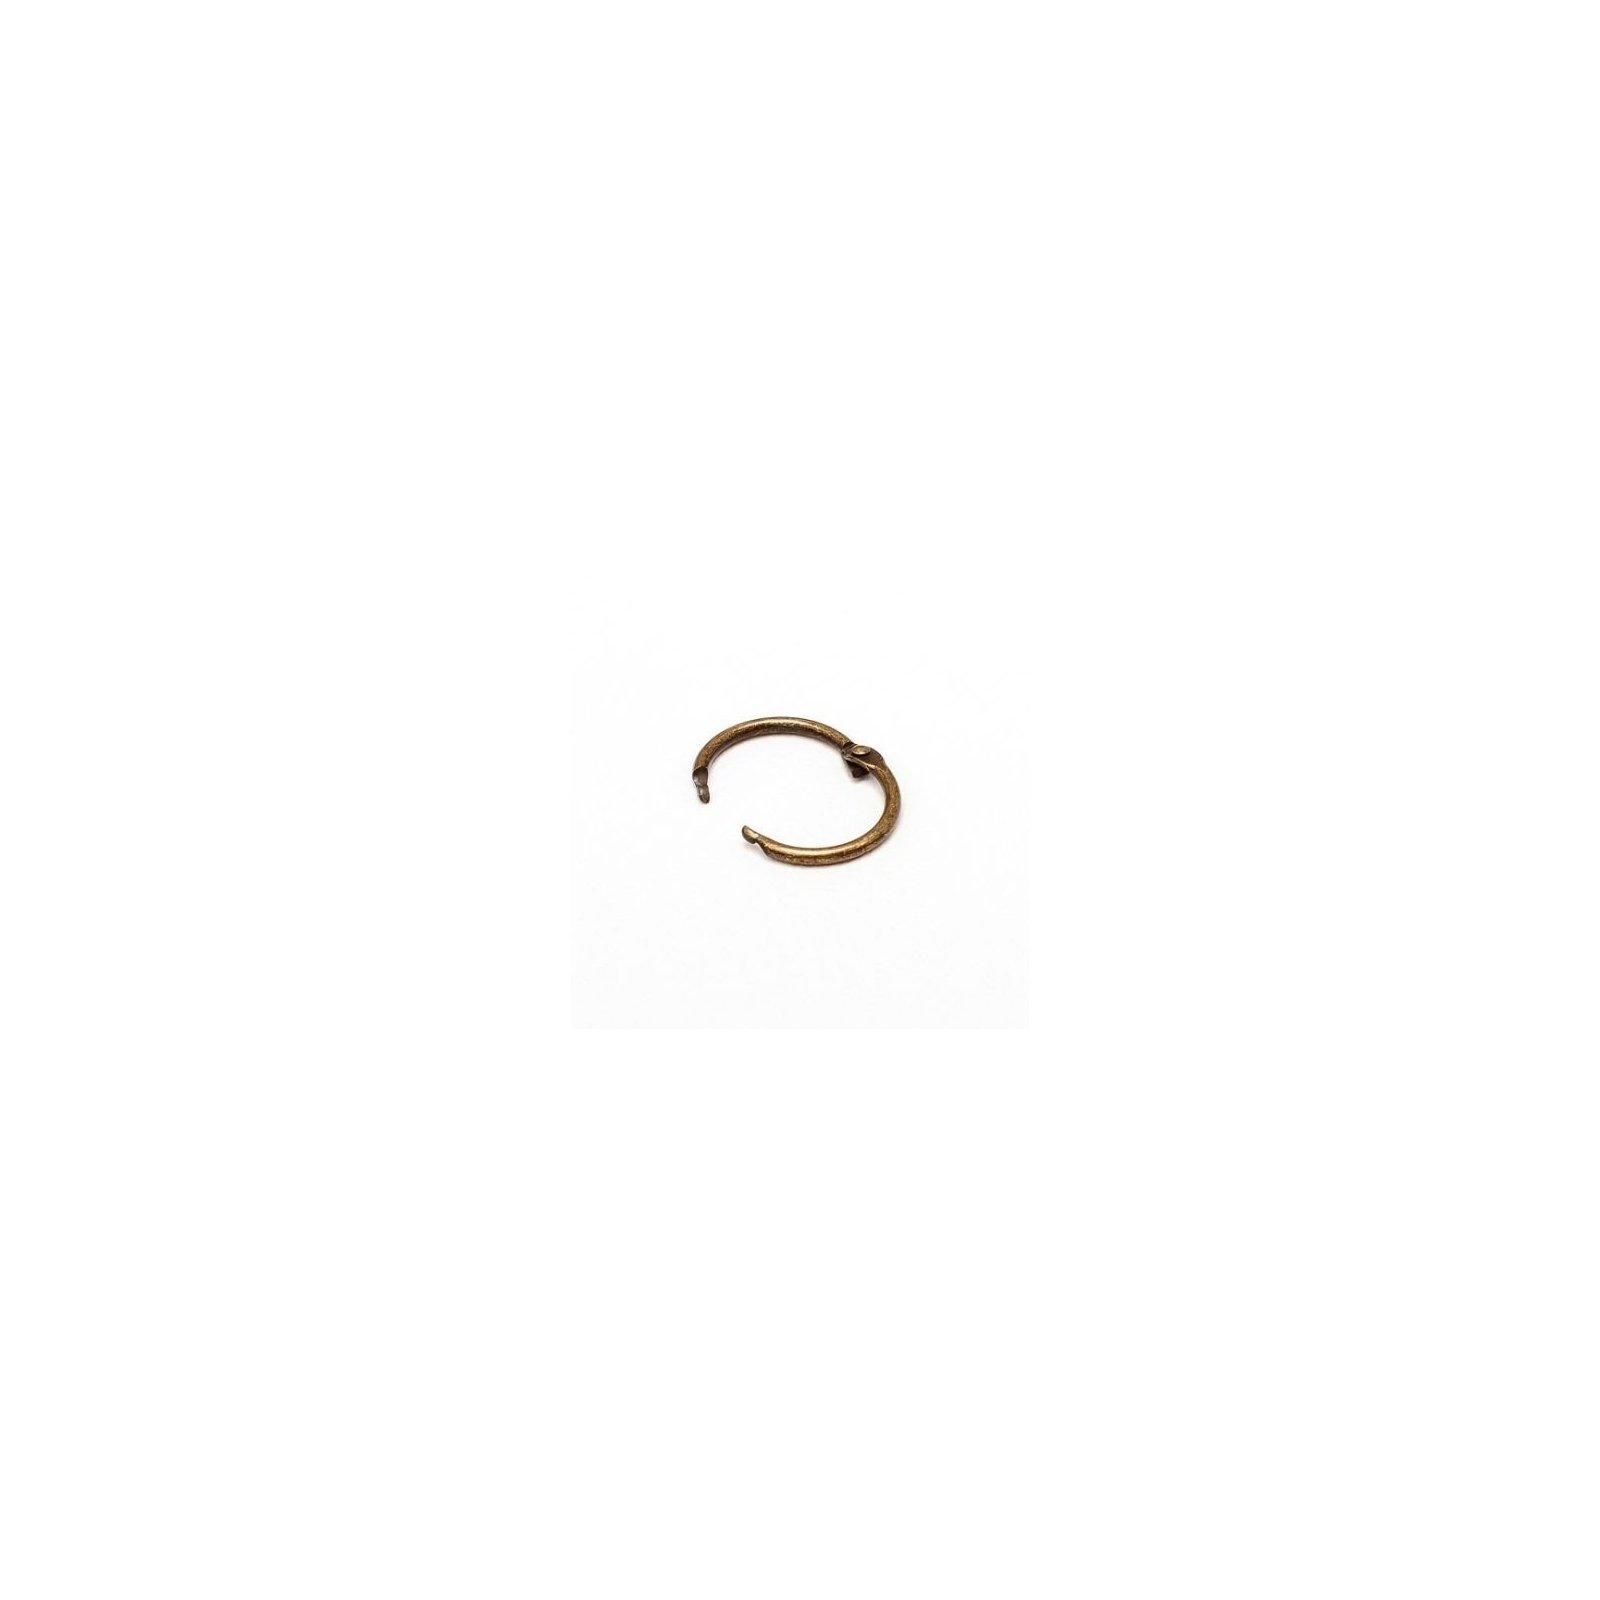 Anneau brisé - Diamètre 25 mm - Bronze- Ephemeria